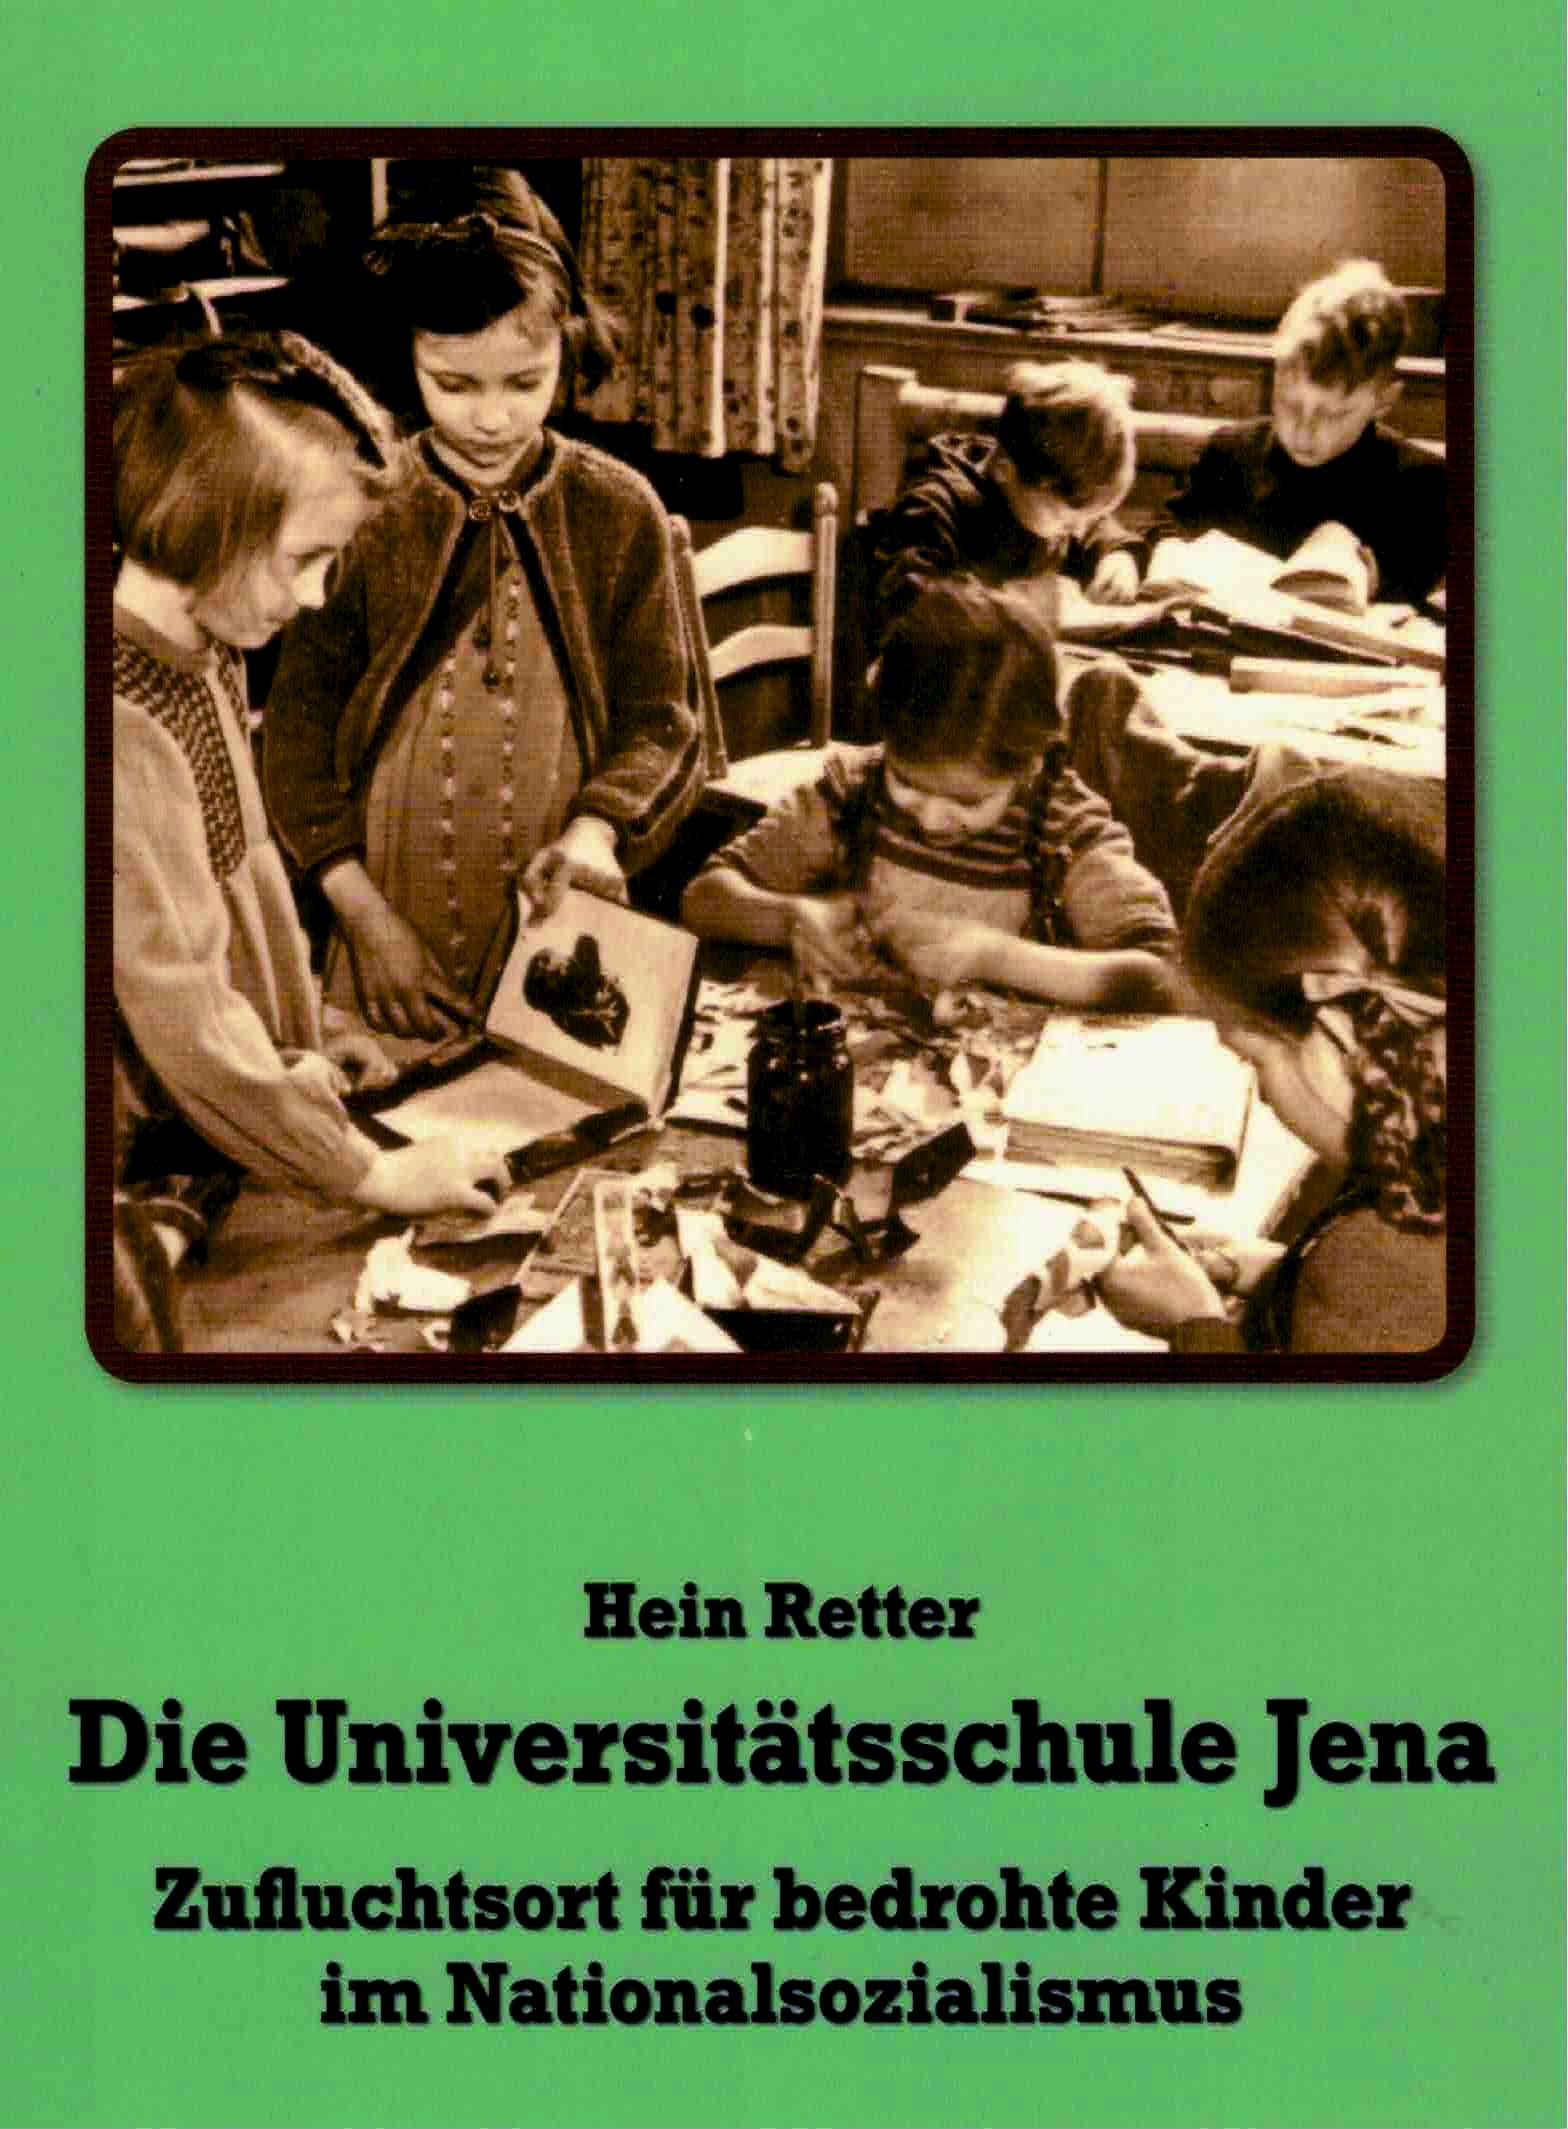 Figure 4: Hein Retter (2010) – Cover picture of the book.